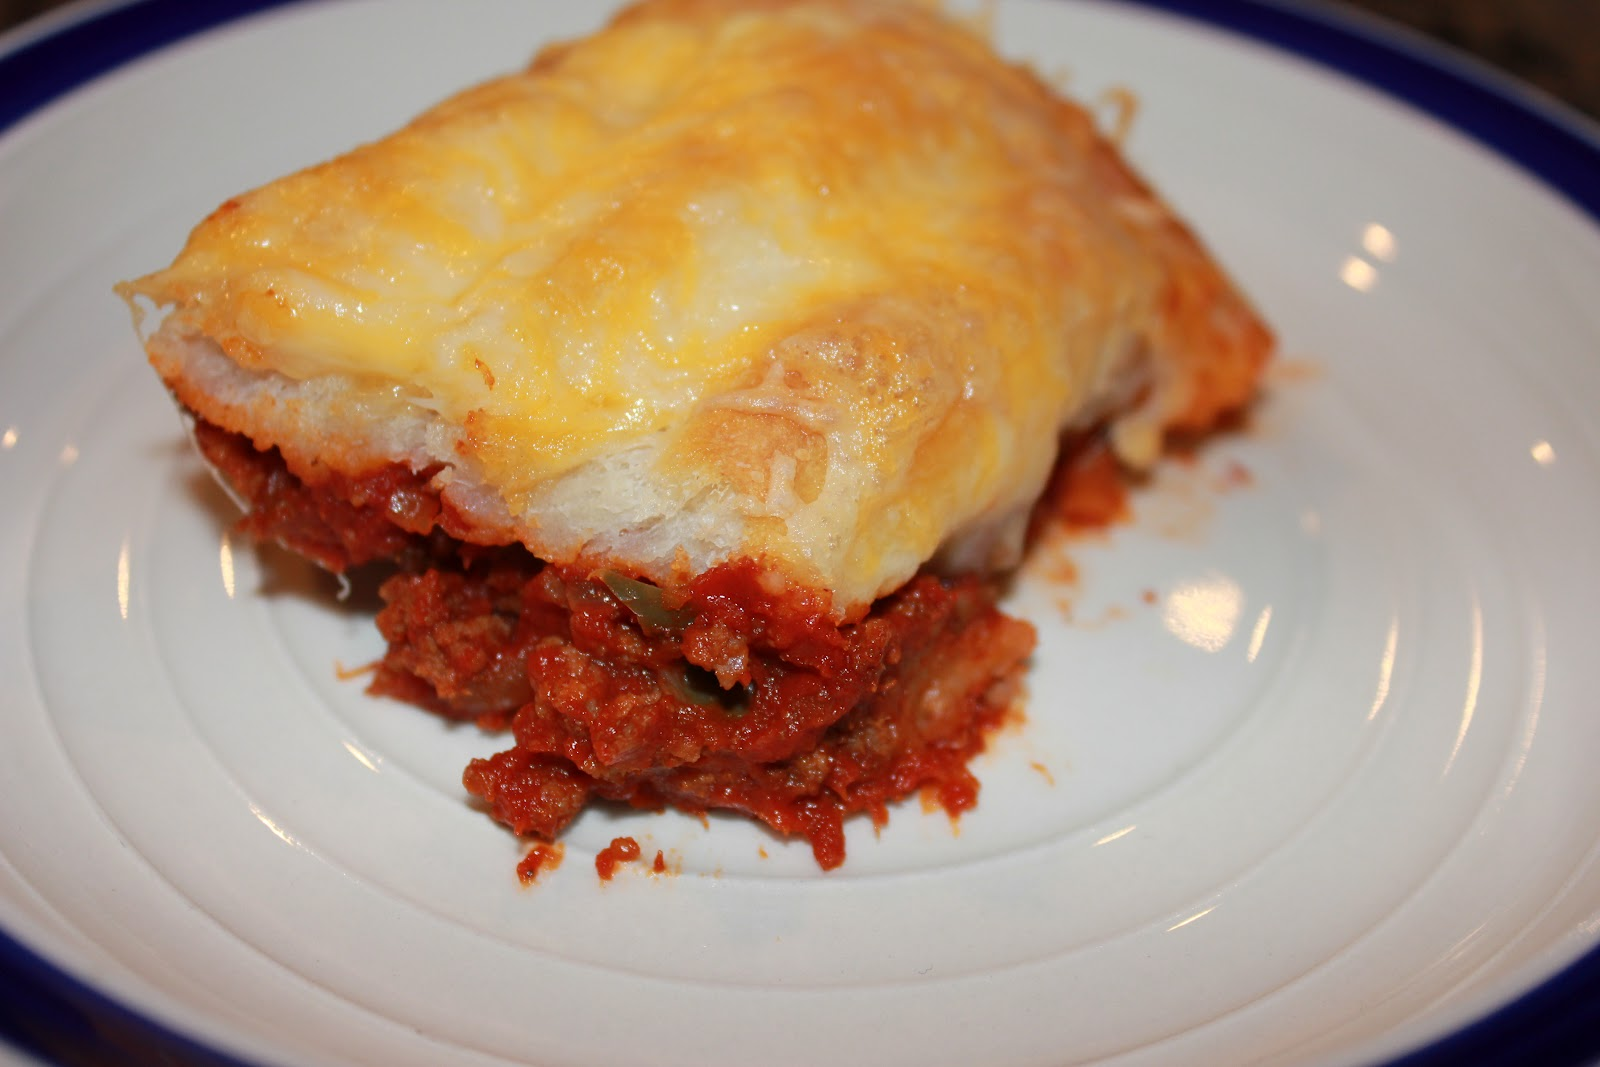 Never trust a skinny cook....: Sloppy joe casserole